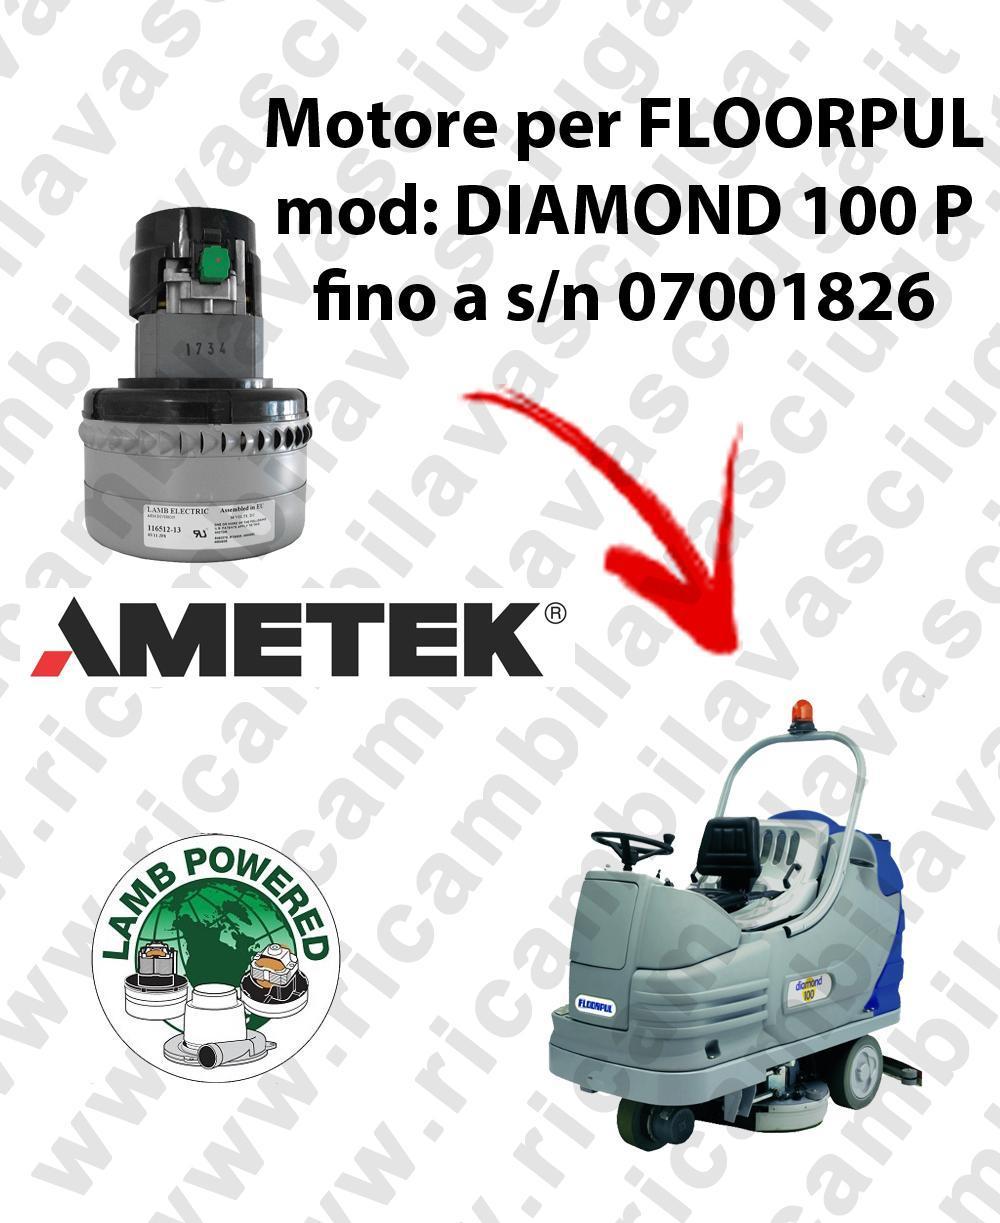 DIAMOND 100 P till s/n 07001826 LAMB AMETEK vacuum motor for scrubber dryer FLOORPUL